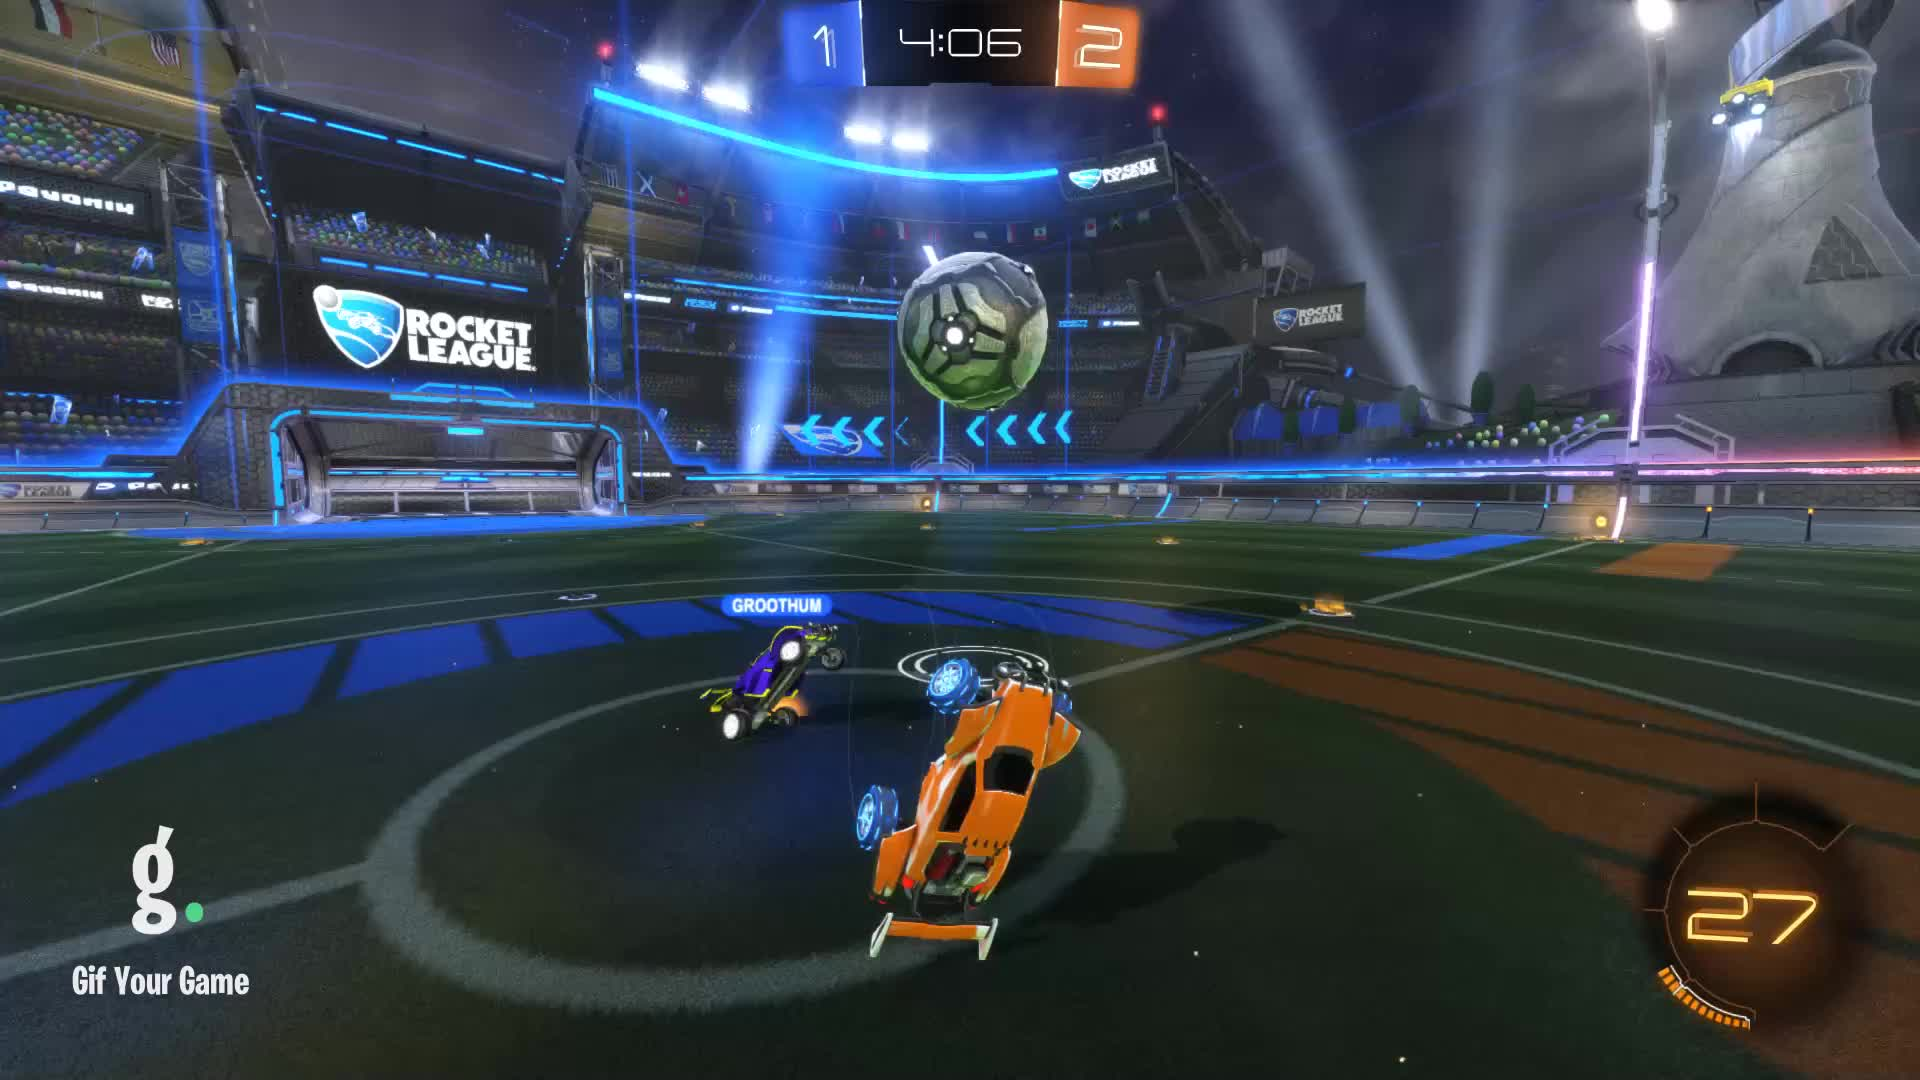 Gif Your Game, GifYourGame, Goal, Not soussouni1, Rocket League, RocketLeague, Goal 4: Not soussouni1 GIFs